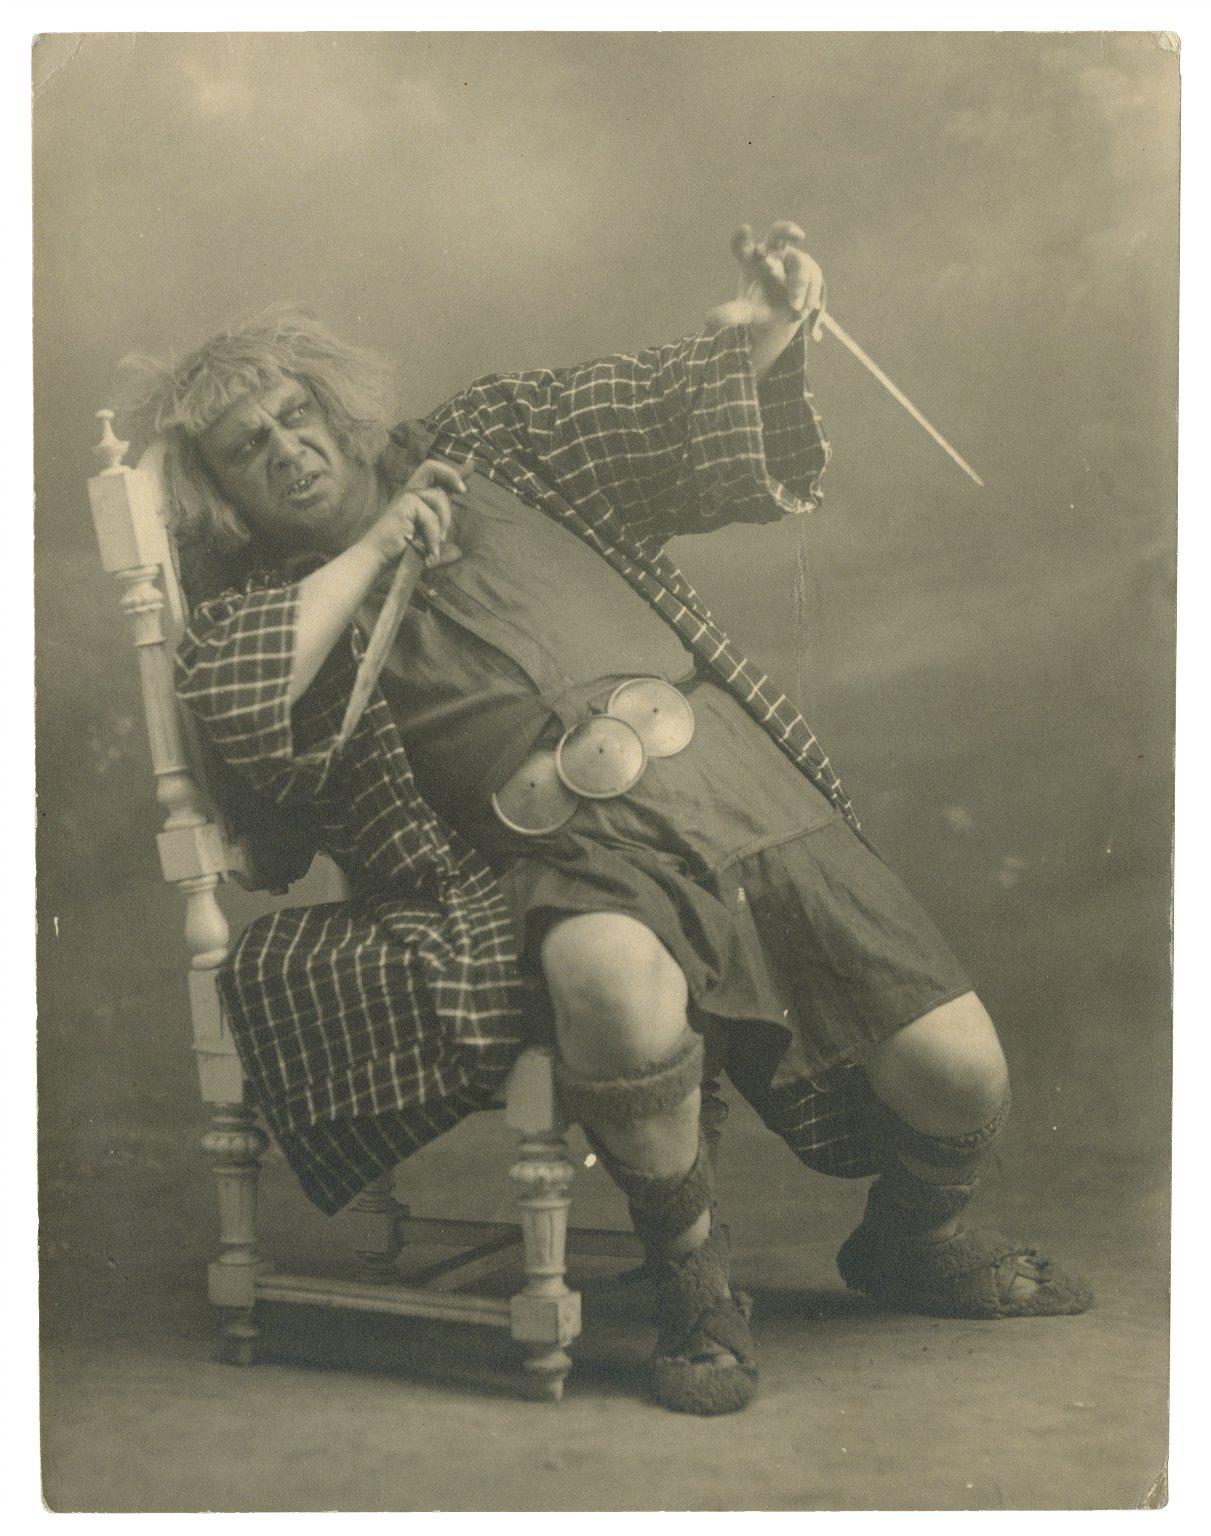 [Emilios Veakis as Macbeth, in the Kotopoulis' Theatre production] [graphic].